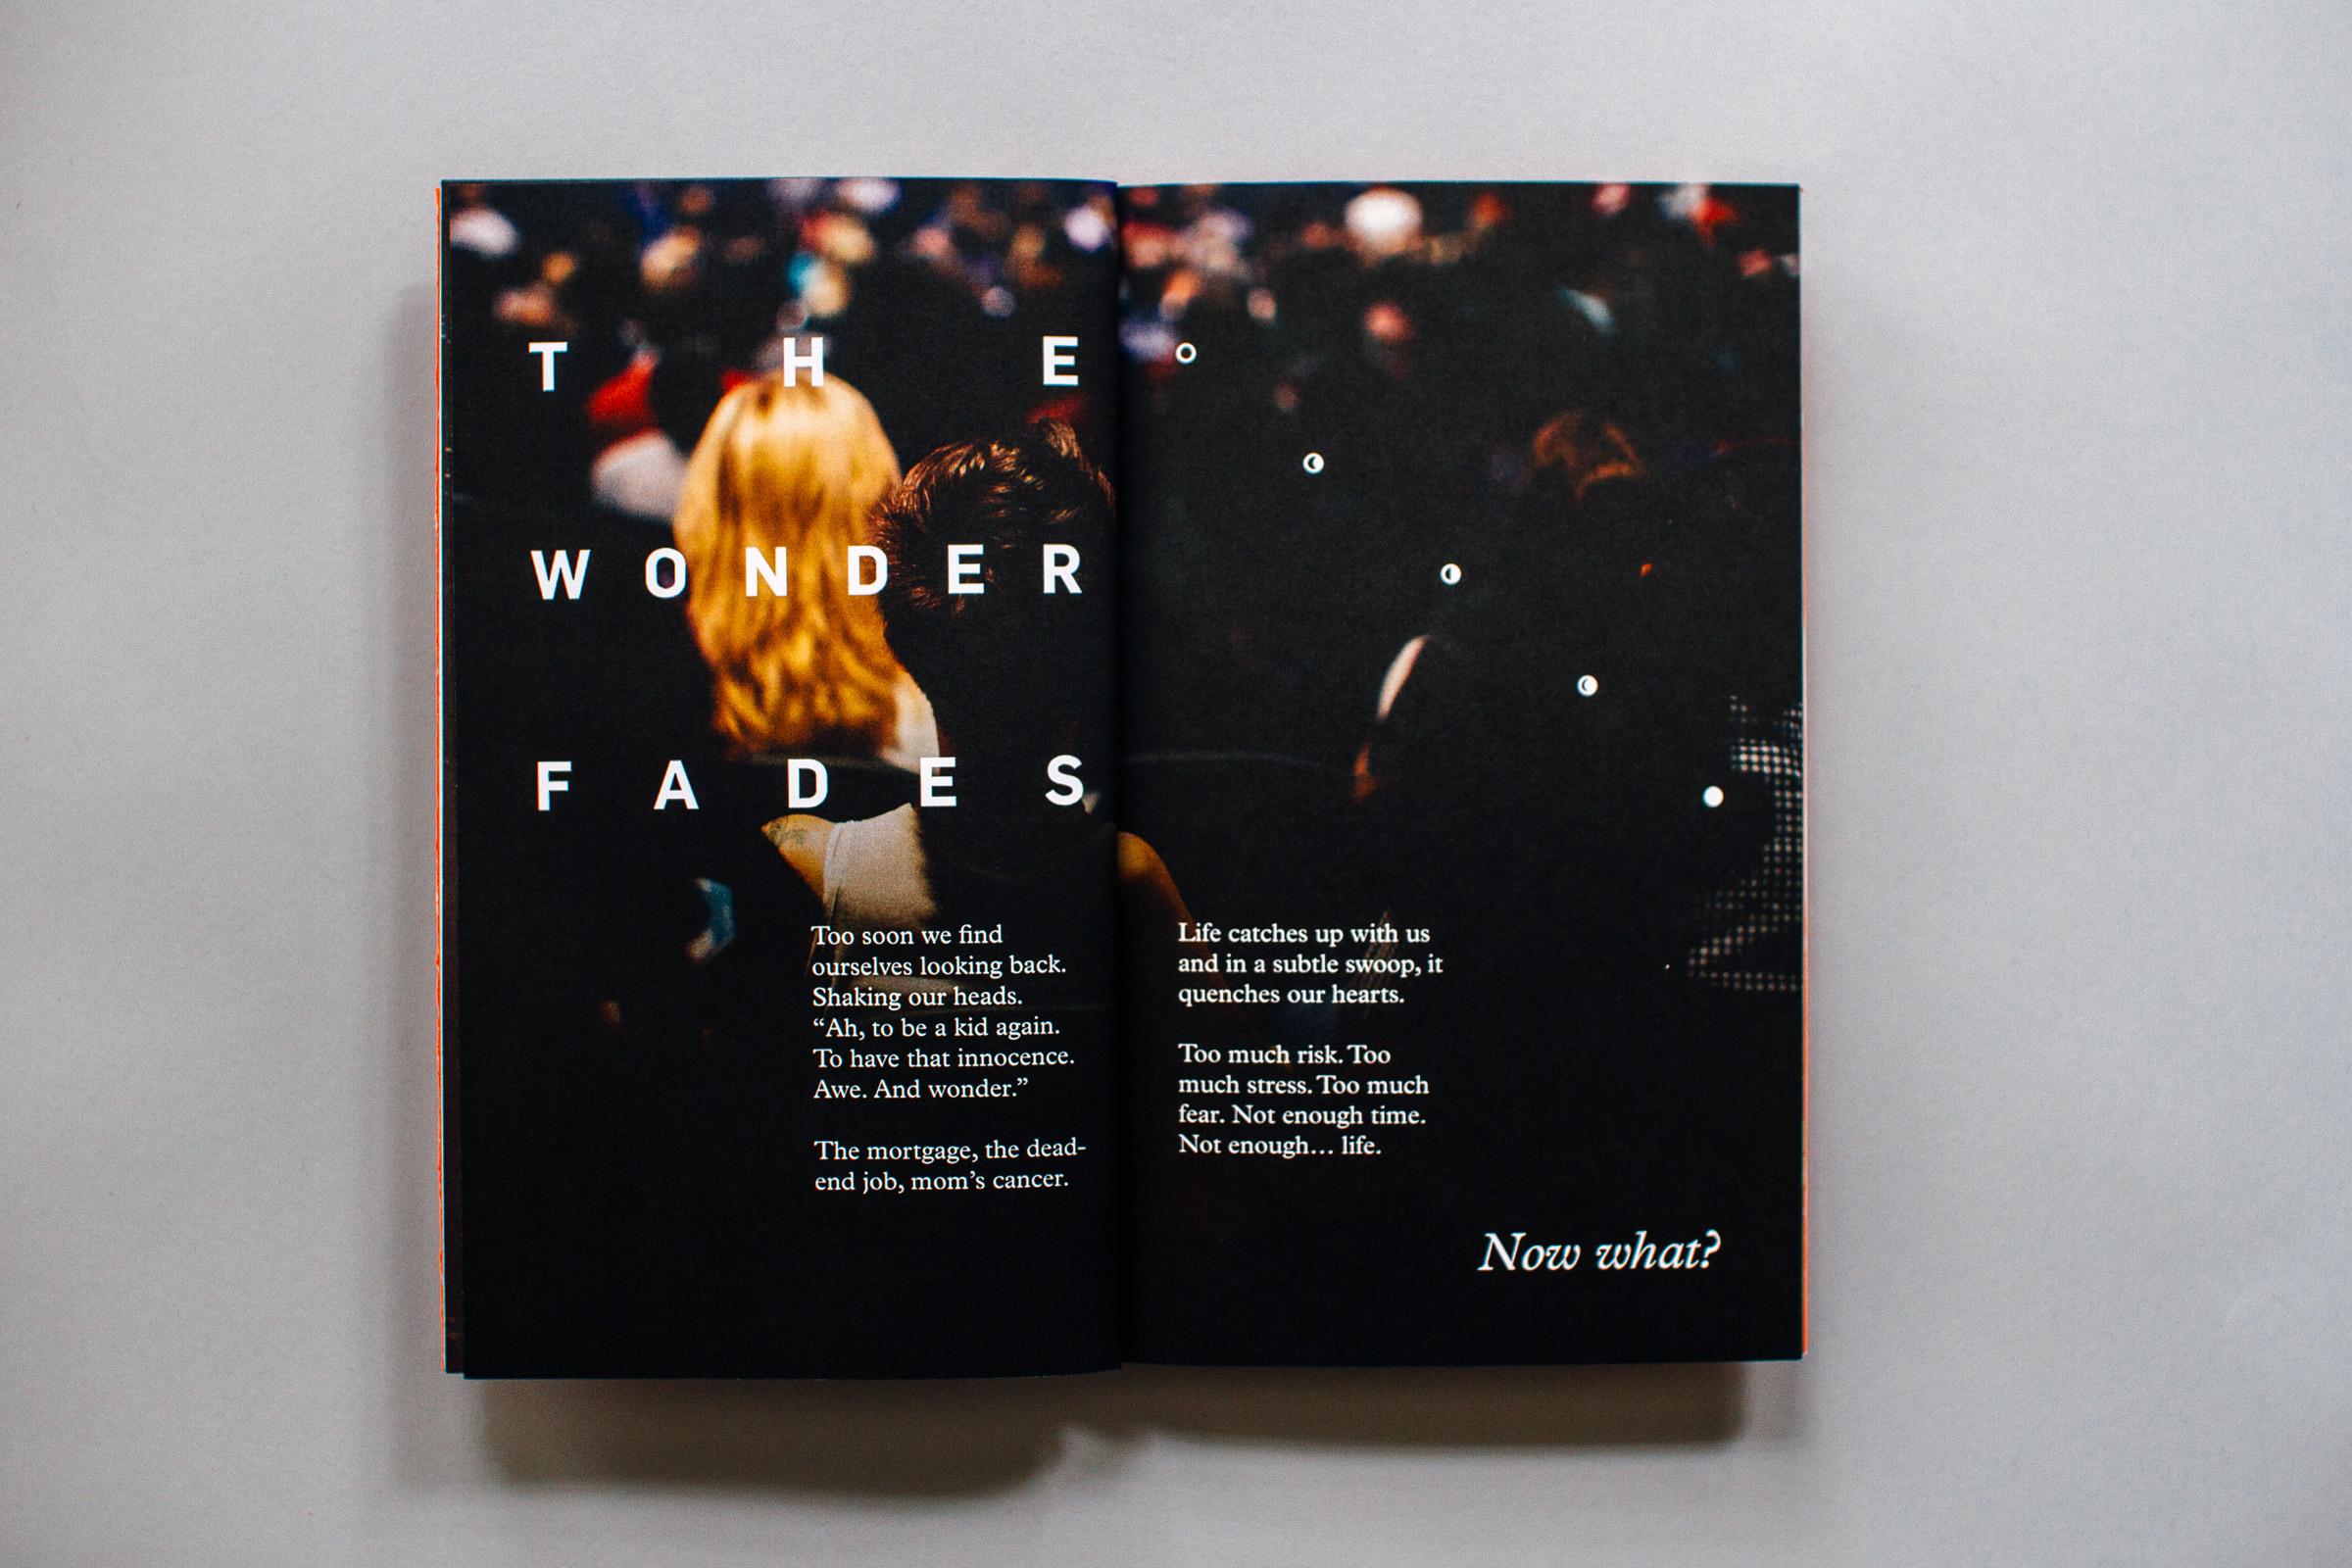 the wonder fades spread